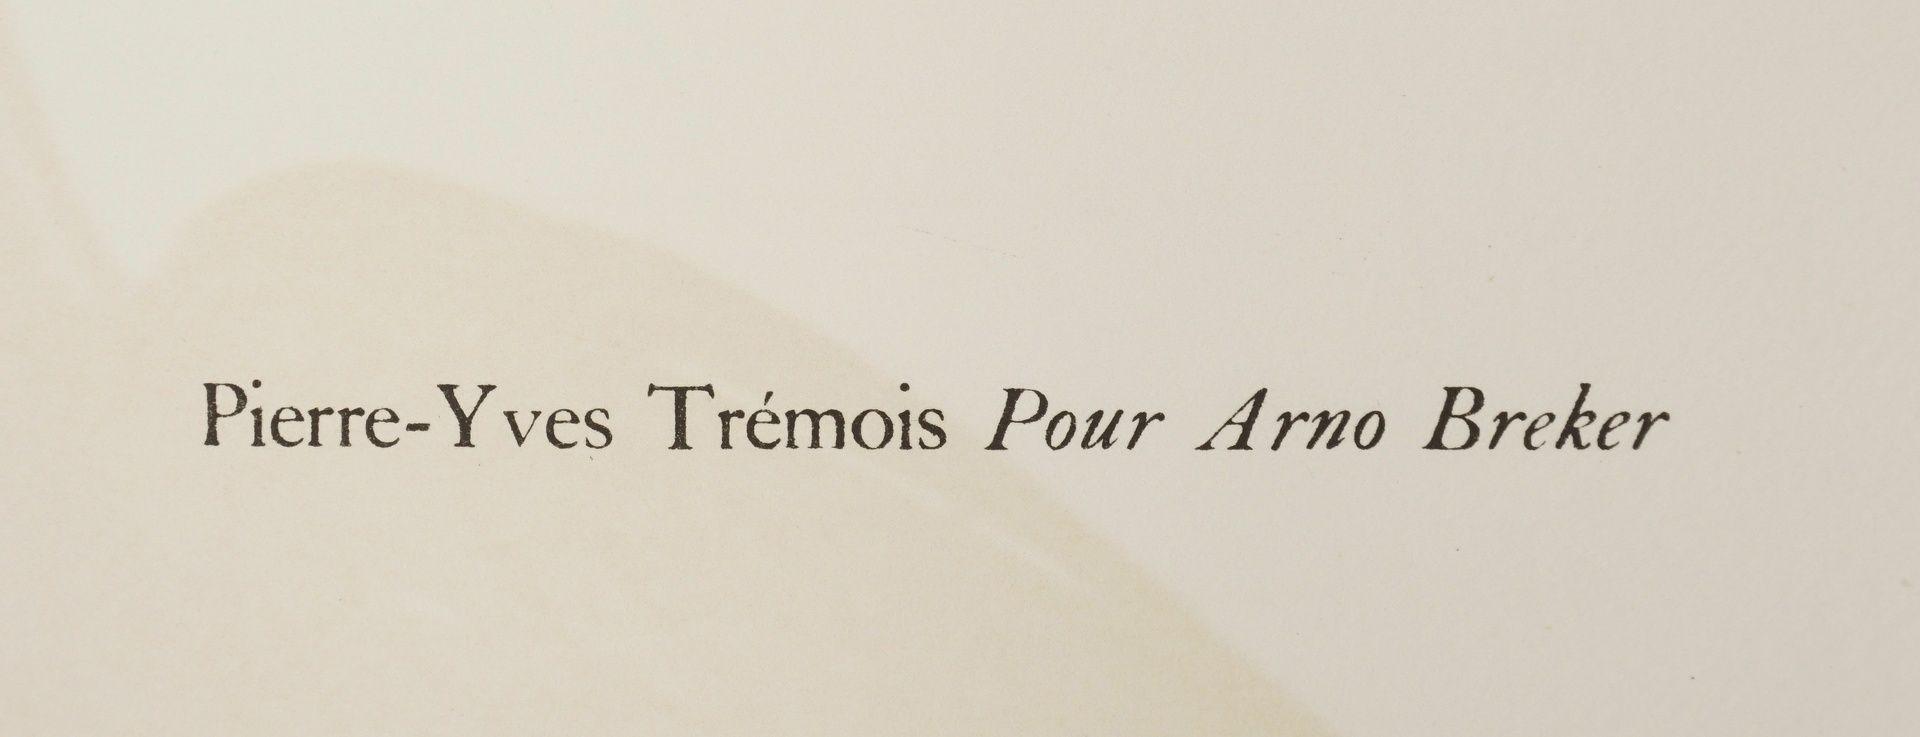 "Pierre-Yves Trémois, ""Pour Arno Breker"" (Für Arno Breker) - Bild 4 aus 4"